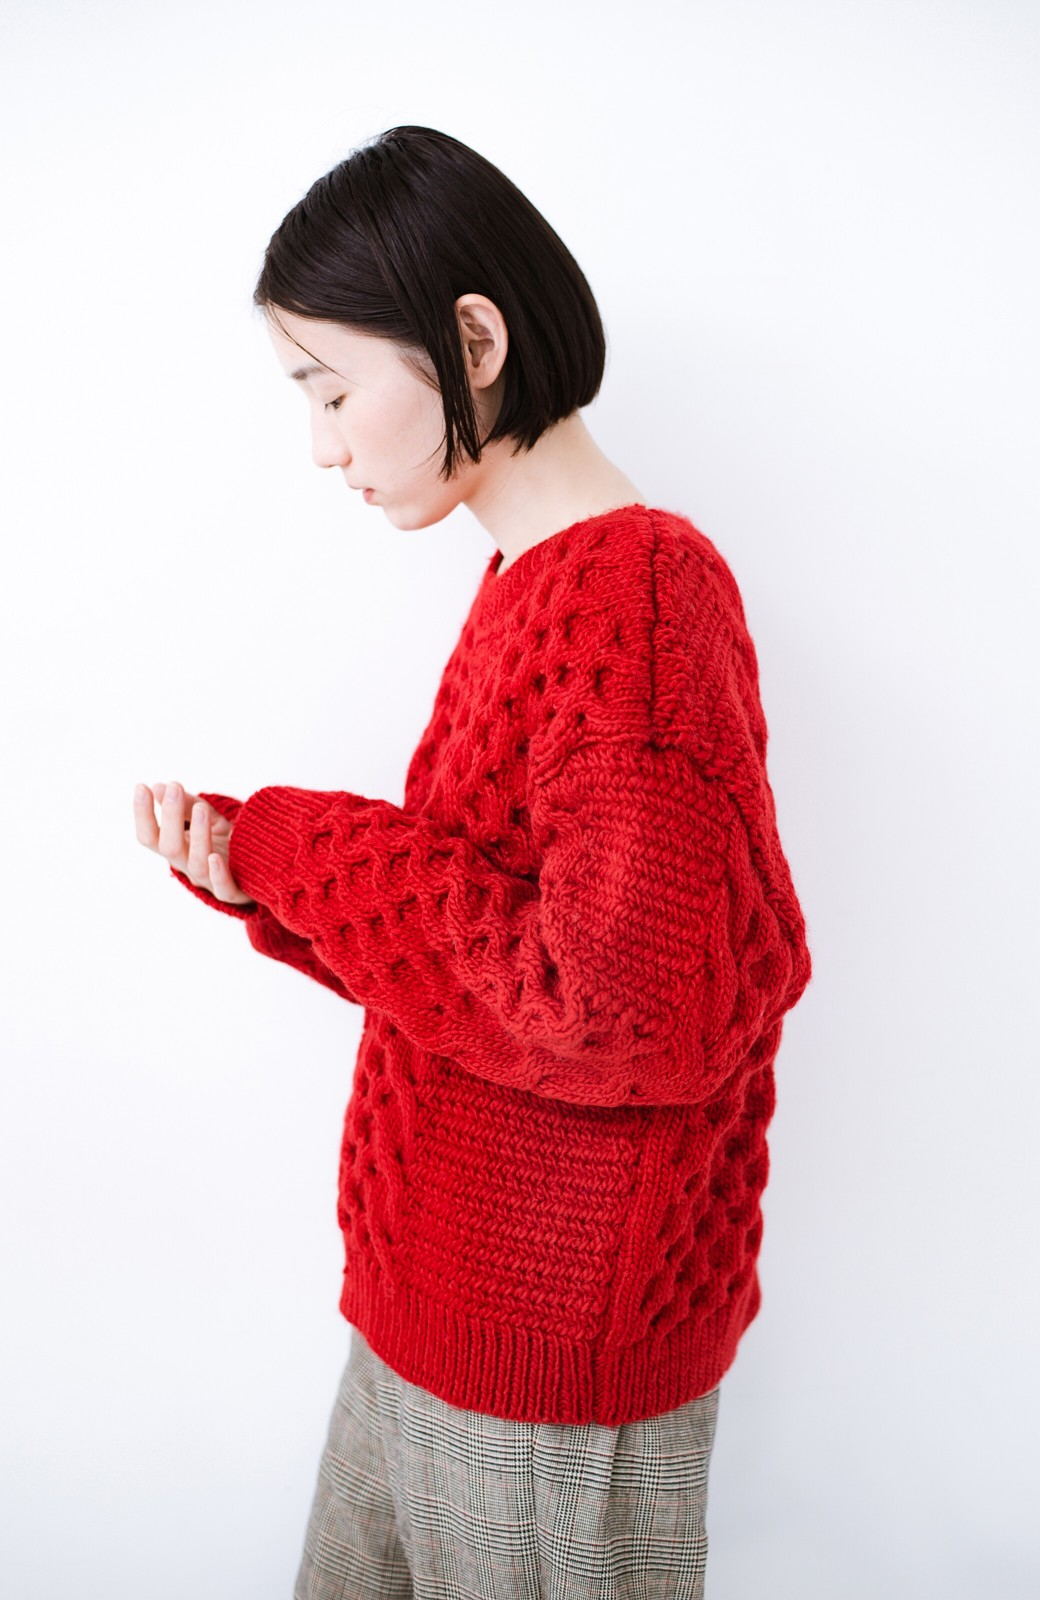 haco! 古着っぽい雰囲気がこなれたパネル編みケーブルニット <レッド>の商品写真12